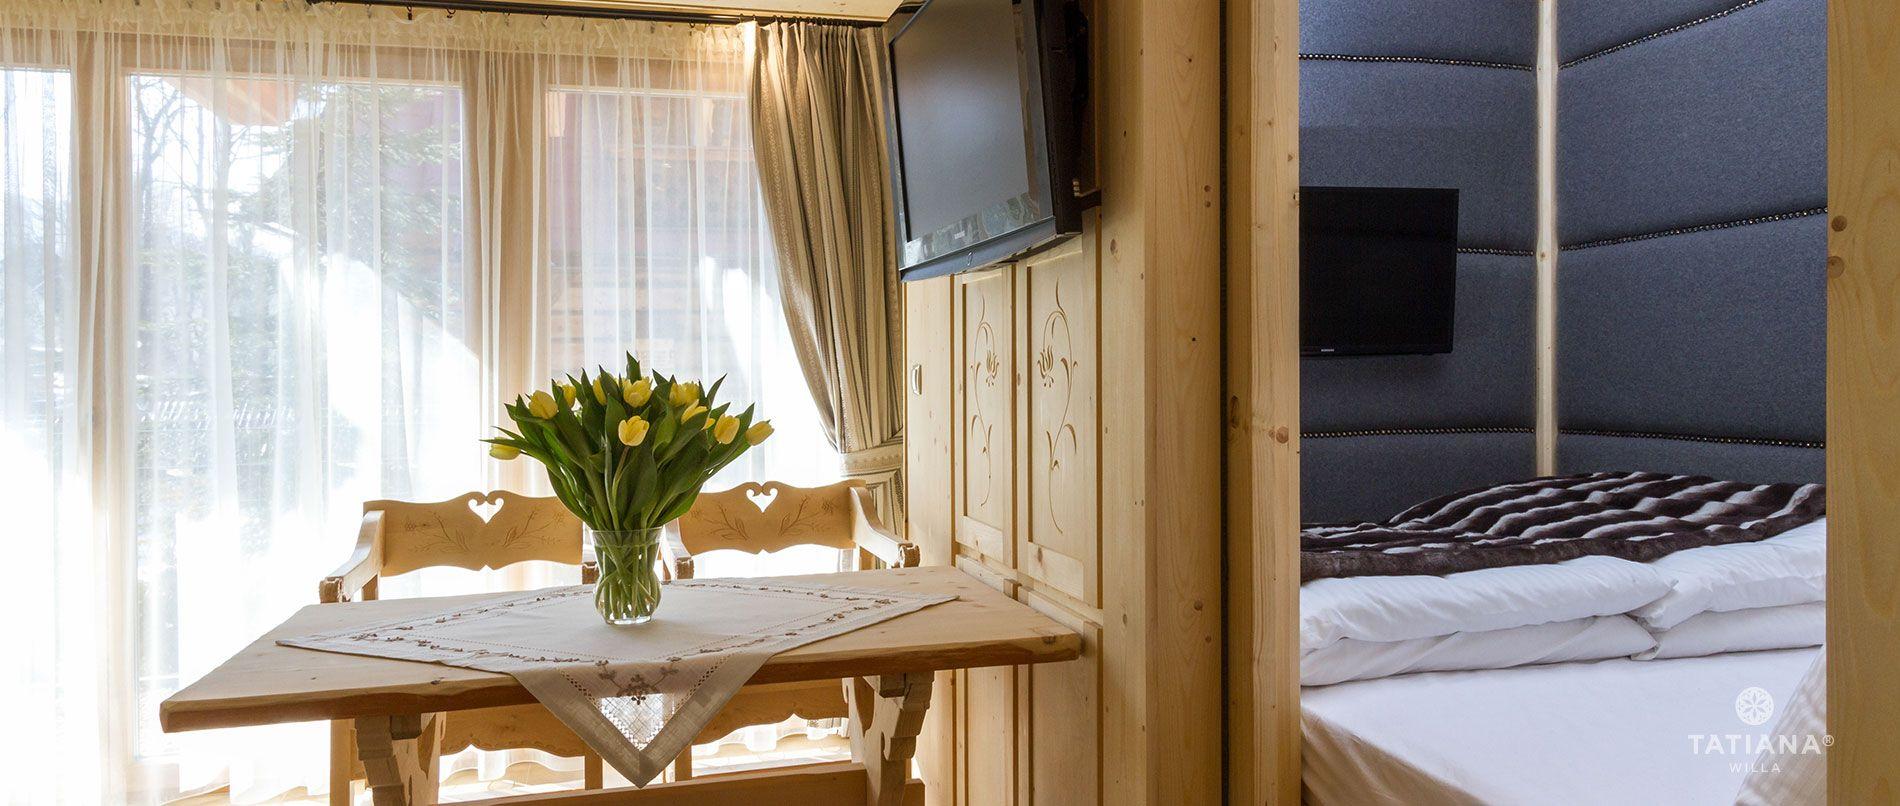 Apartament Sosnowy - druga sypialnia